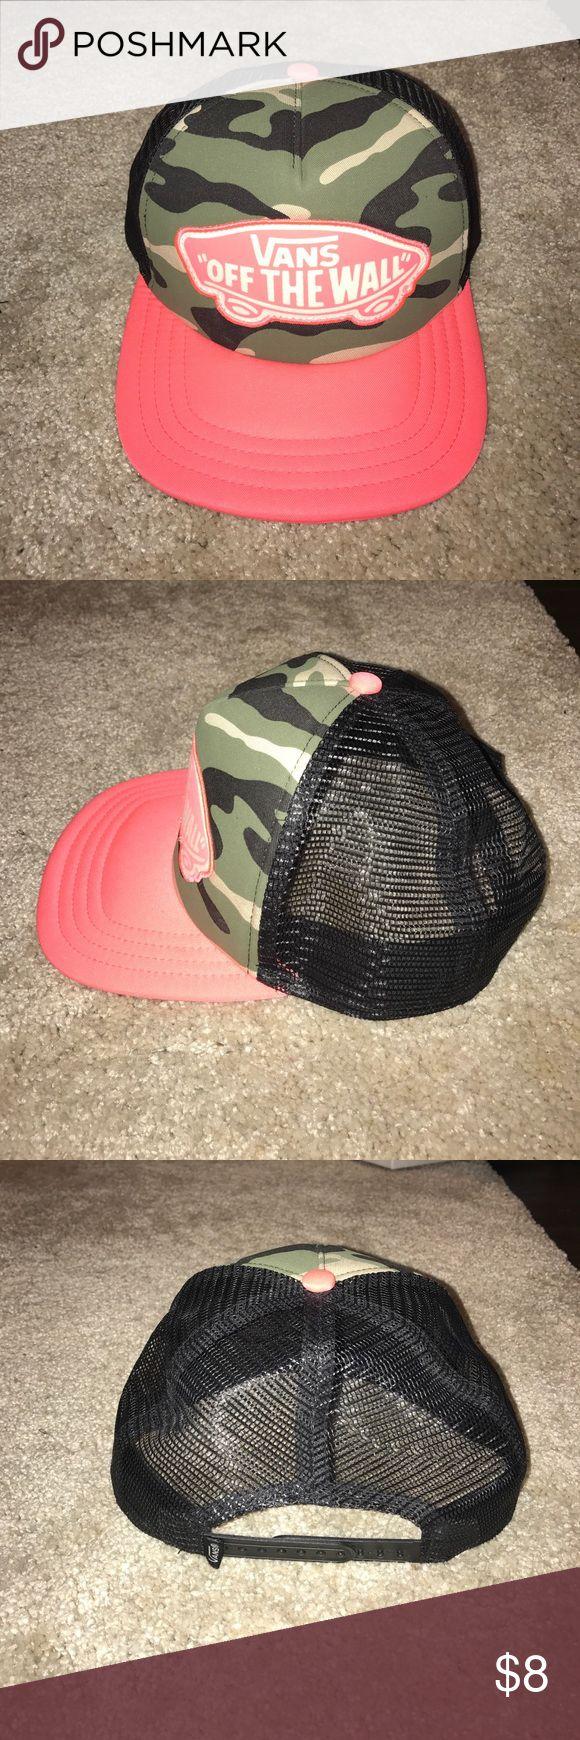 Women's Vans flat bill hat, camo and hot pink Women's Vans flat bill hat, camo and hot pink. Excellent condition. Pet/smoke free home Vans Accessories Hats